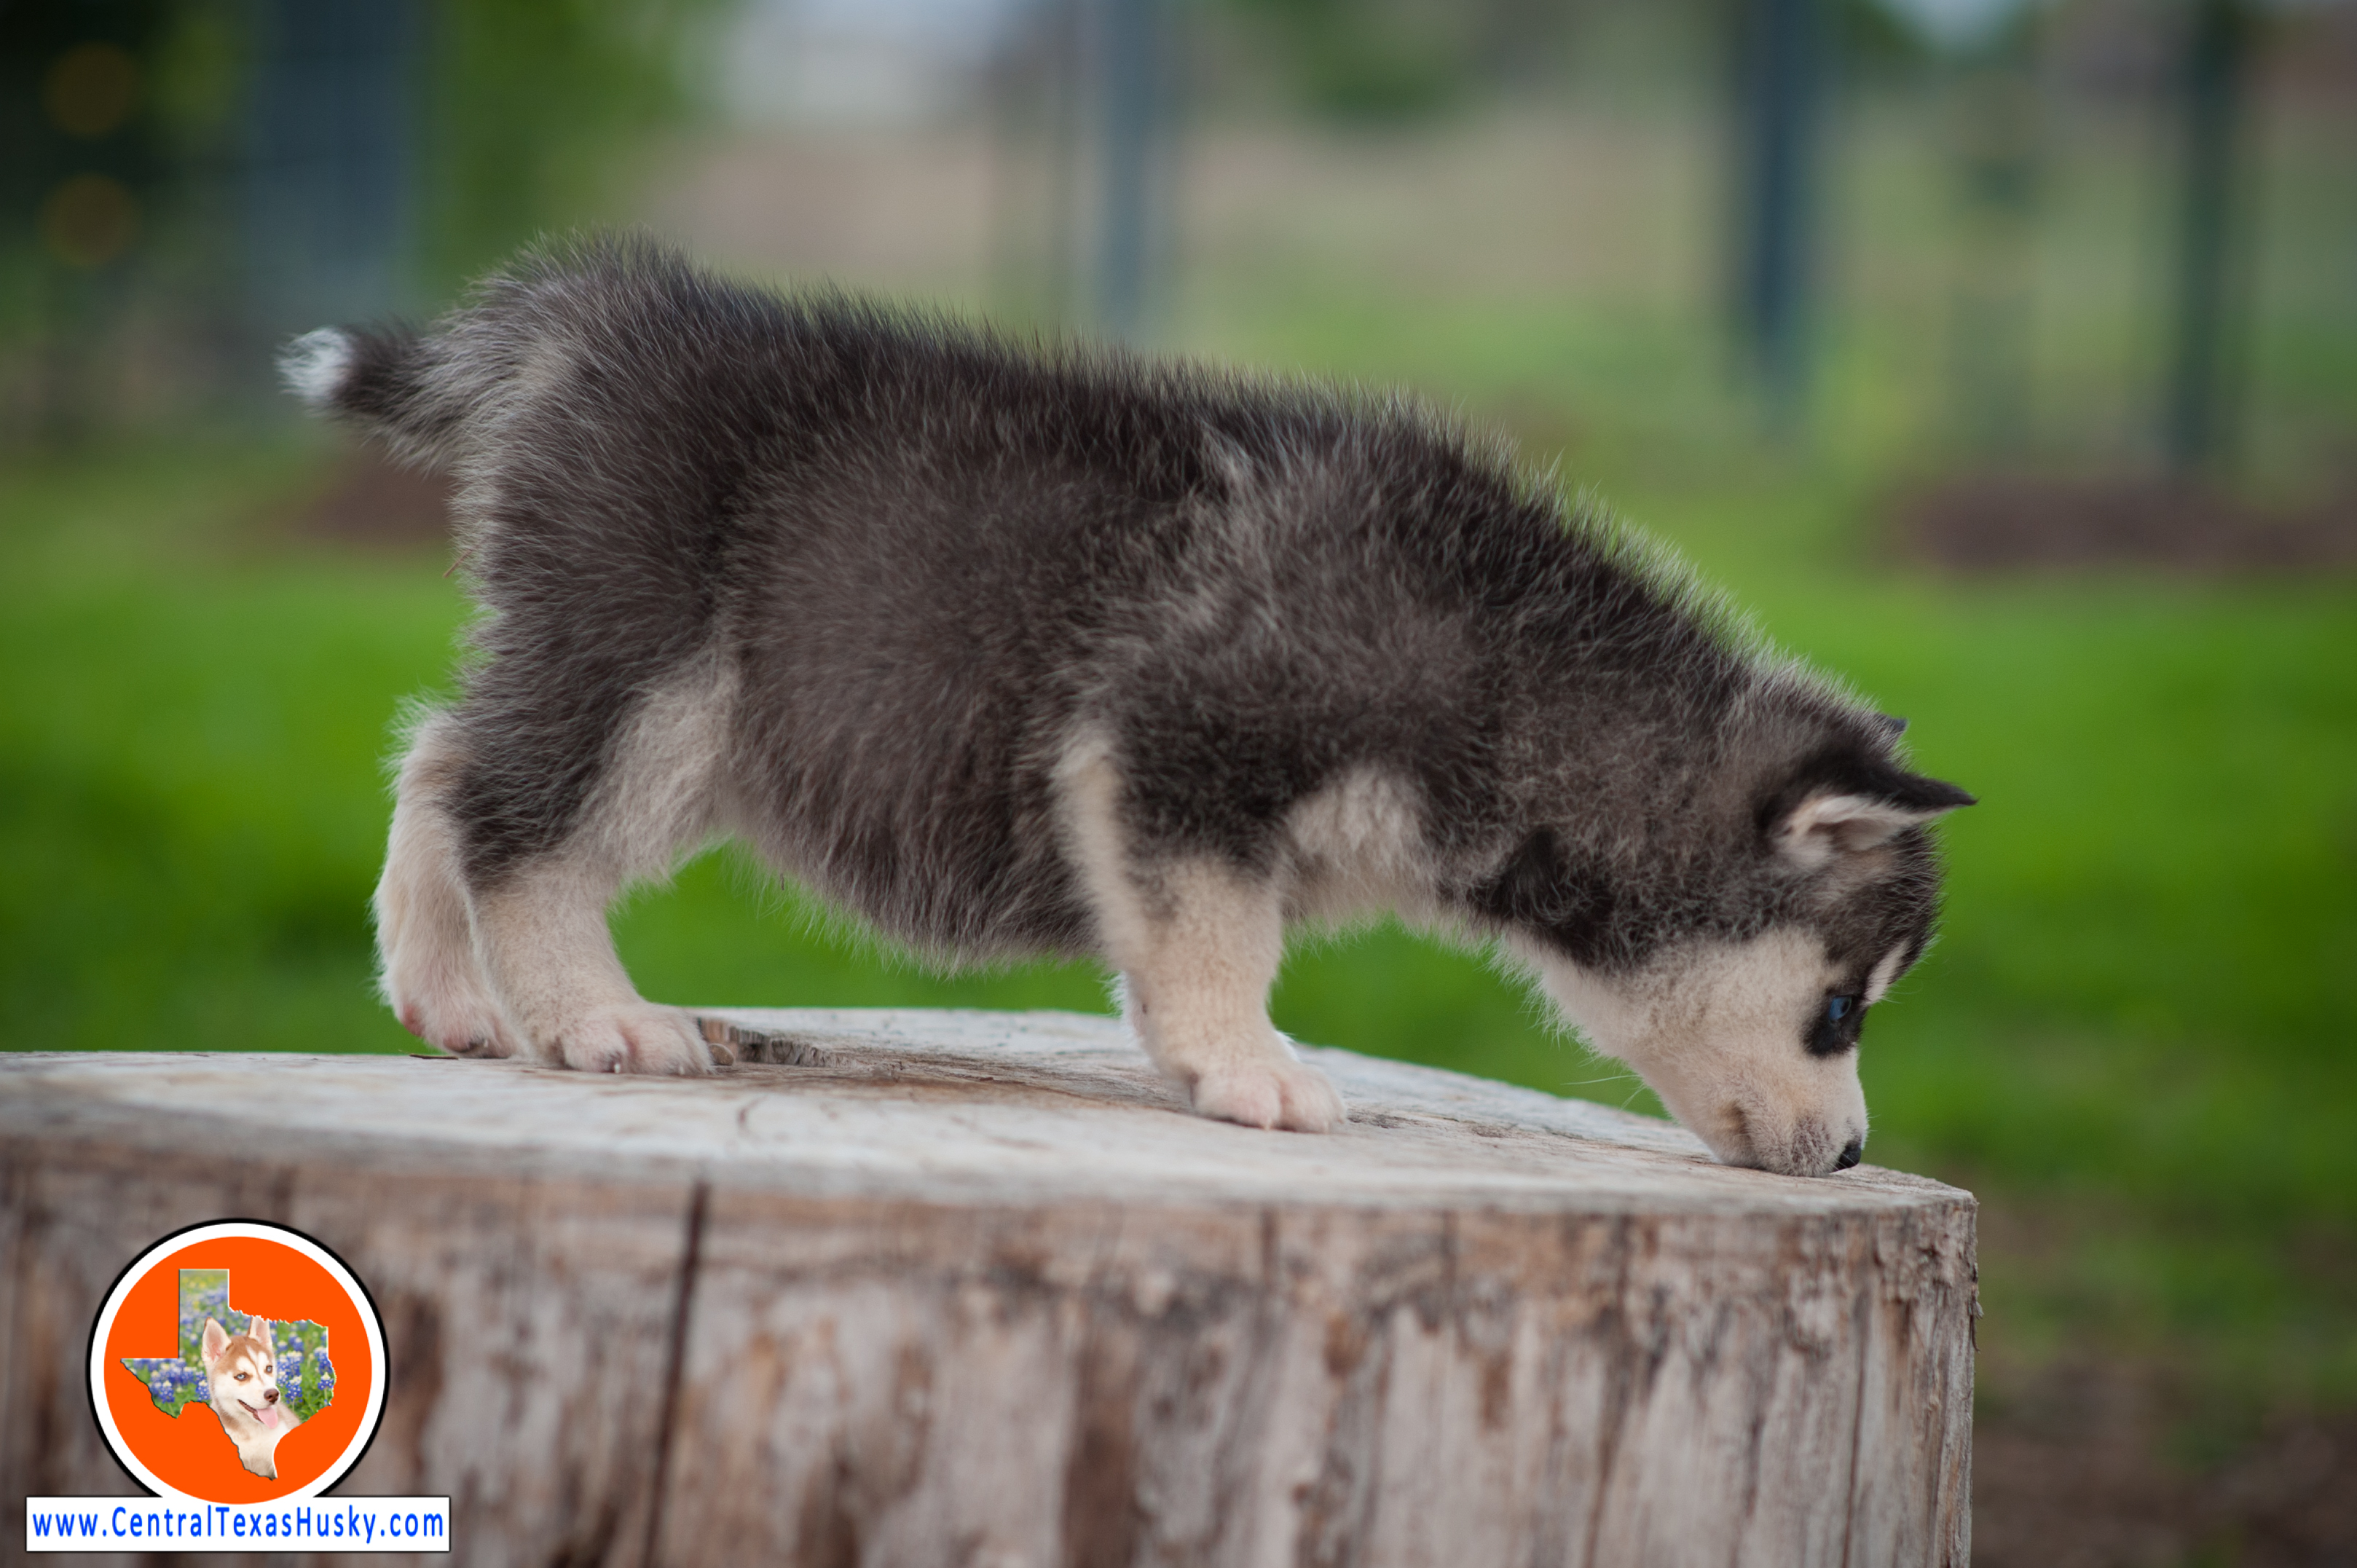 central-texas-husky_austin-siberian-husky-breeder_703966_20180324